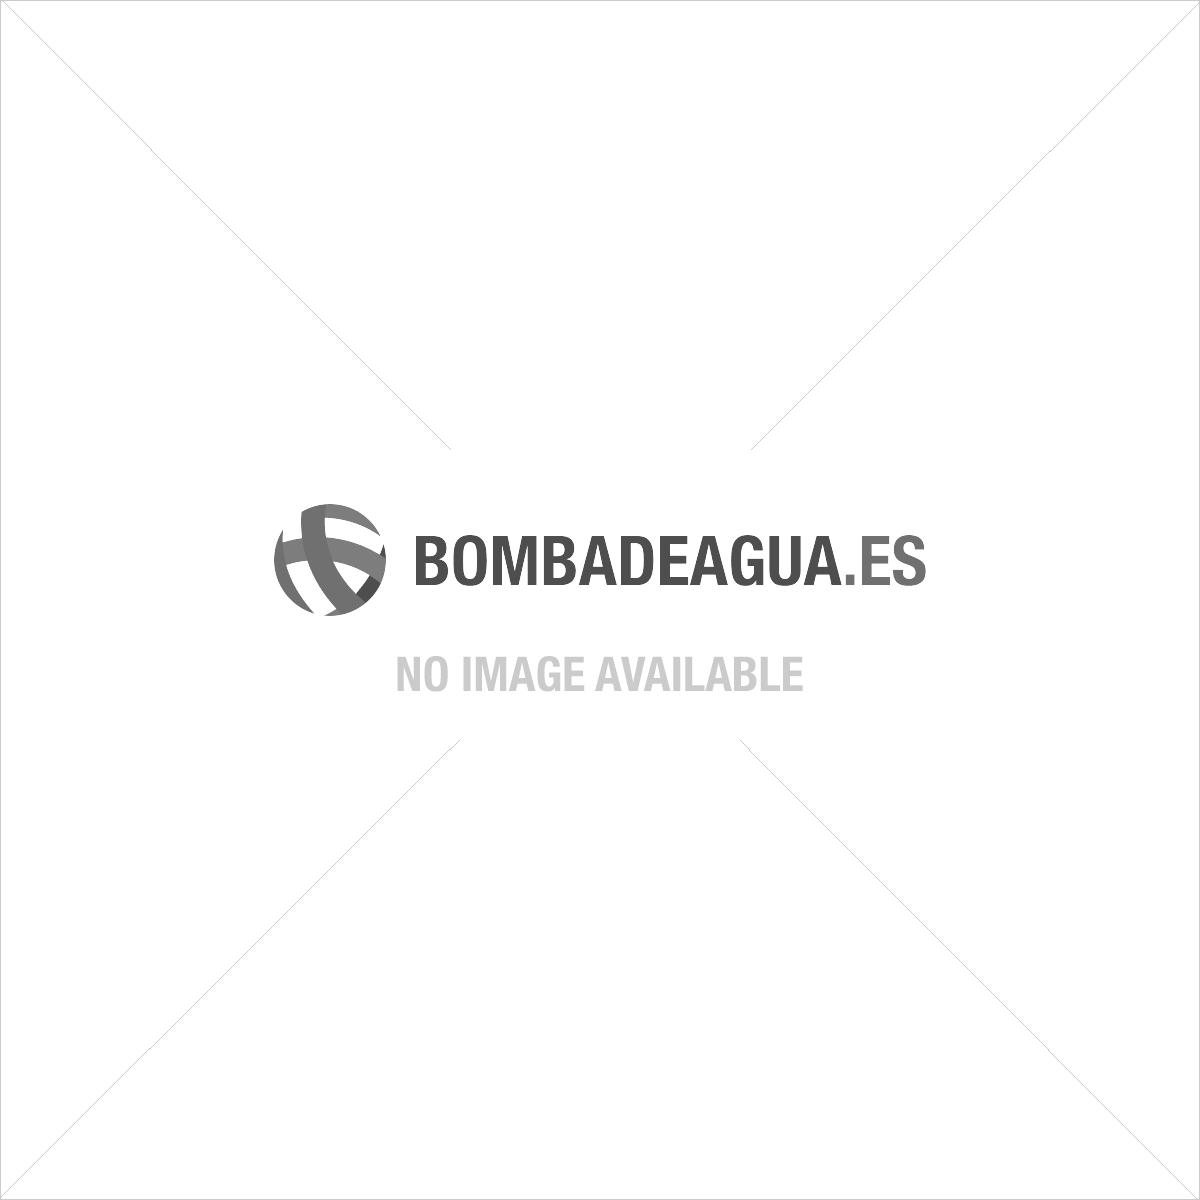 Set de bomba de presurización Tallas D-BOOST 850